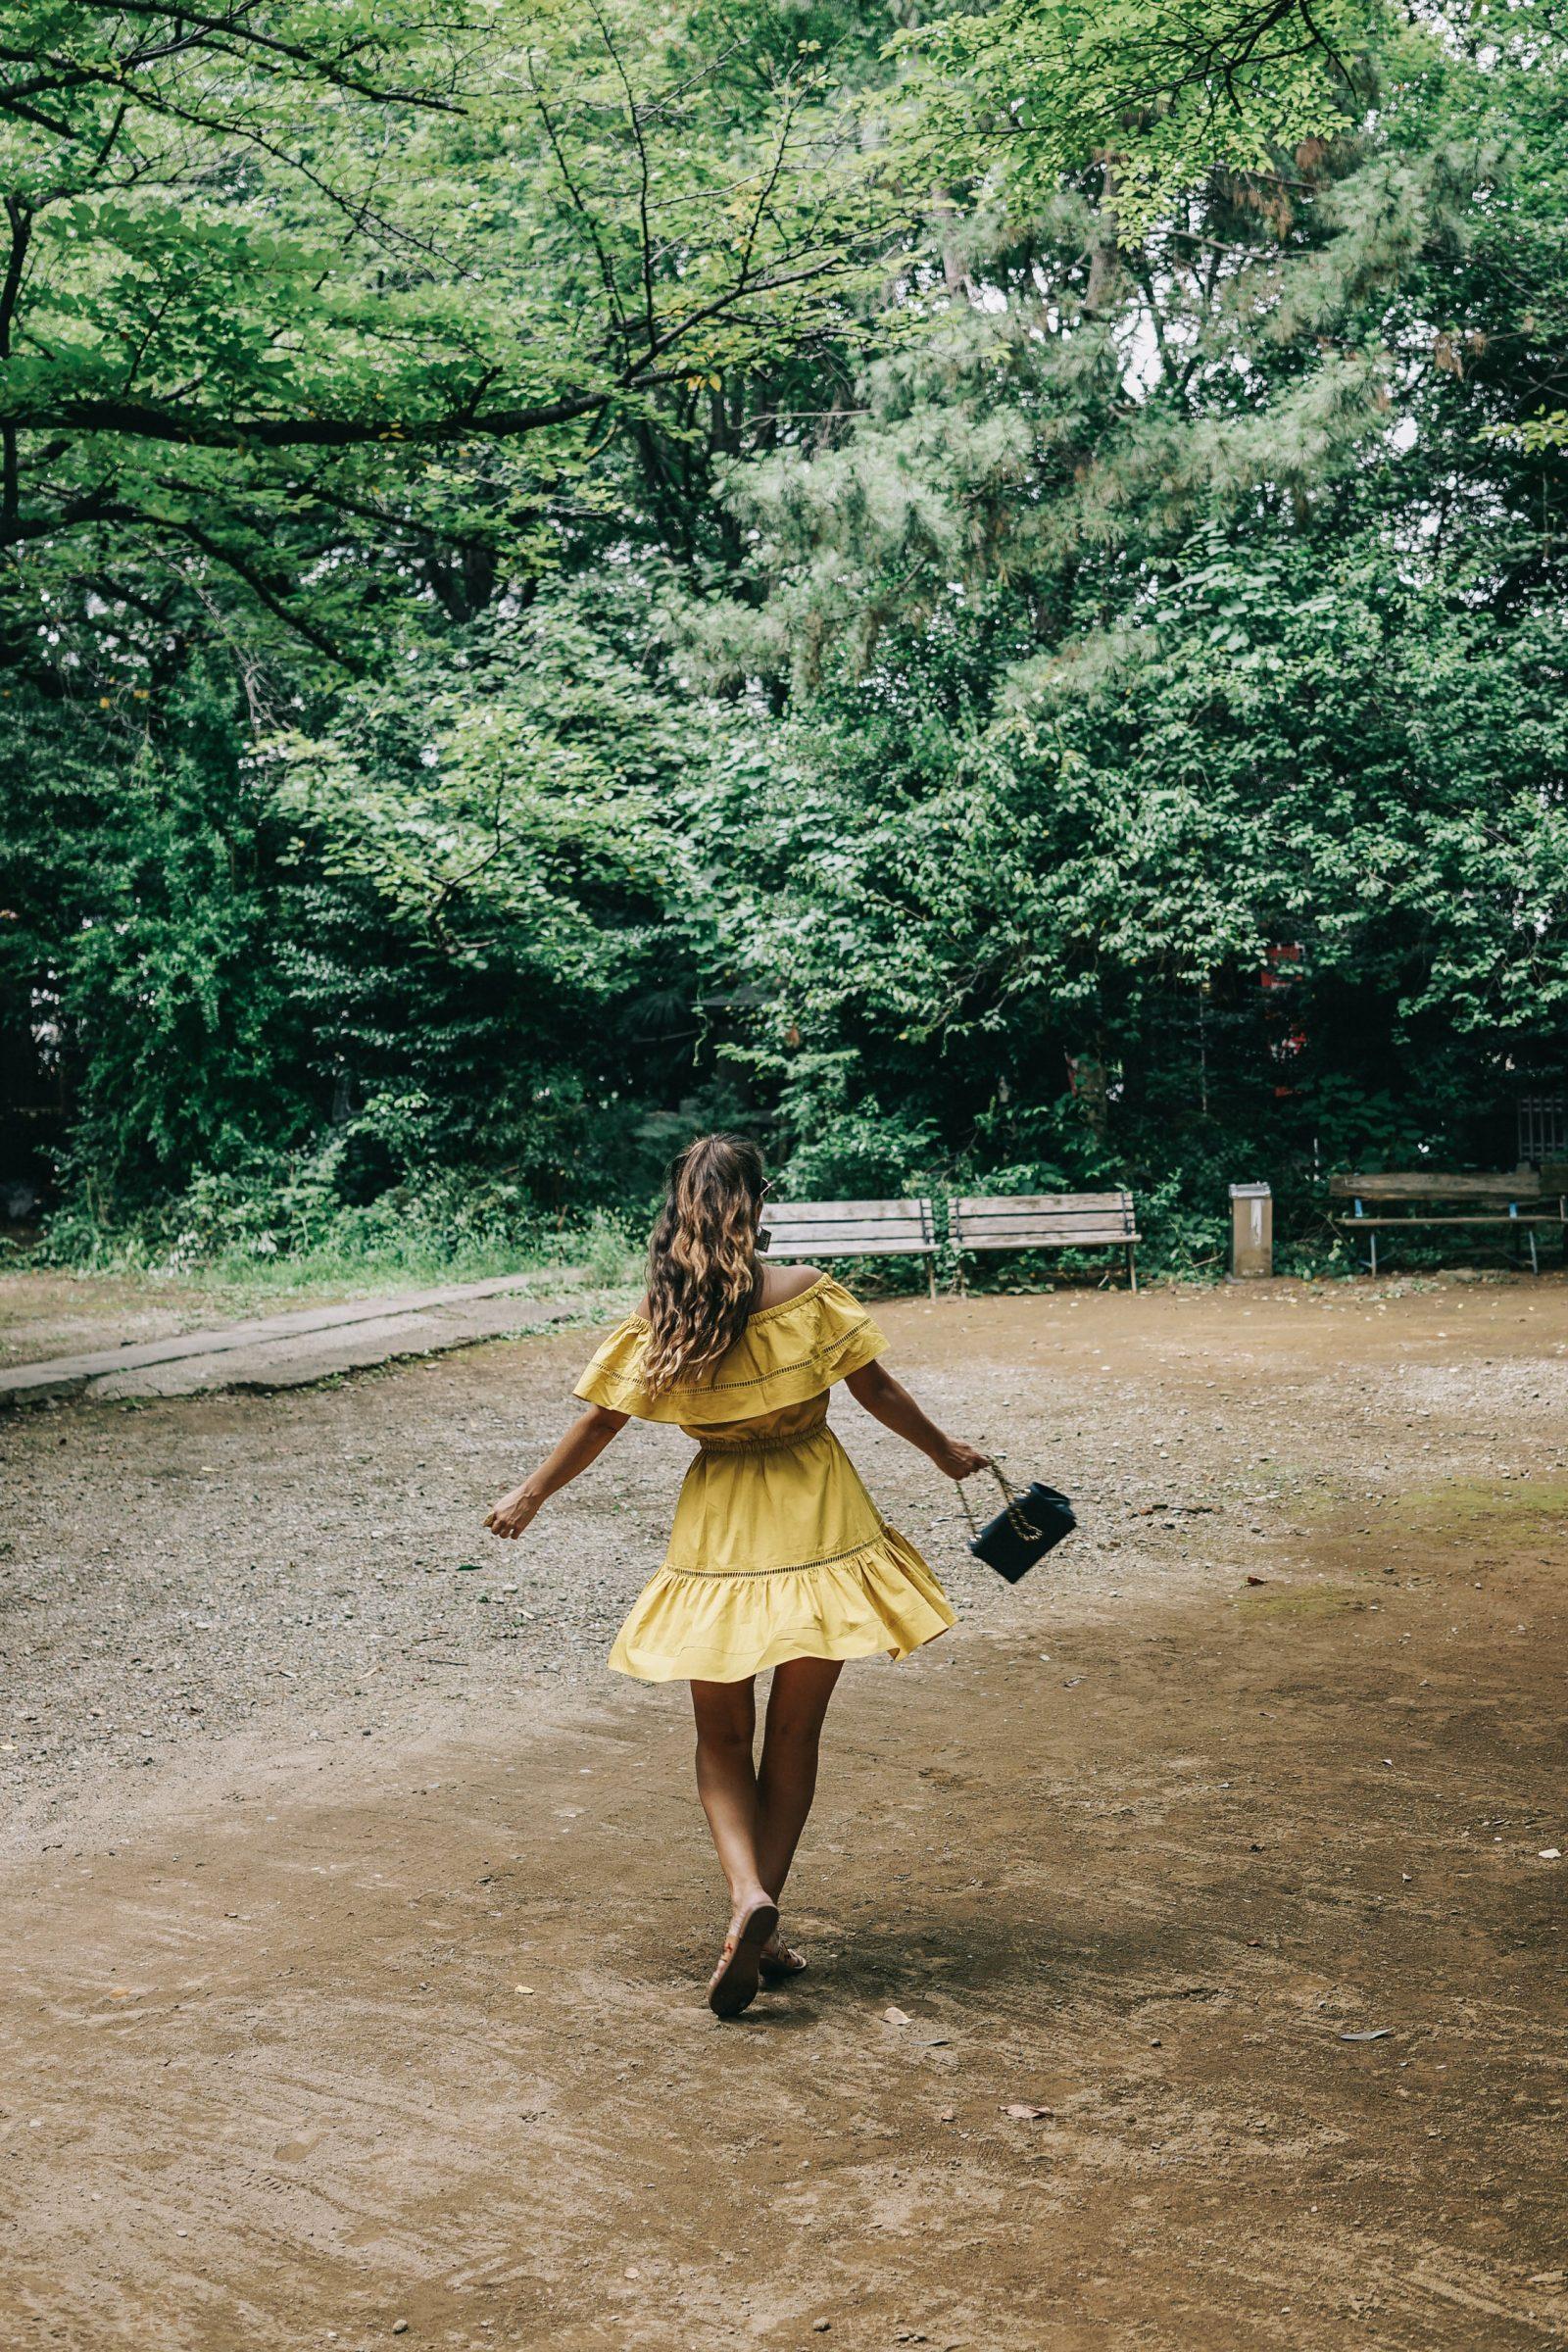 tokyo_travel_guide-outfit-collage_vintage-street_style-off_the_shoulders_dress-mustard_dress-soludos_sandals-chanel_vintage-bag-vintage_stores-24